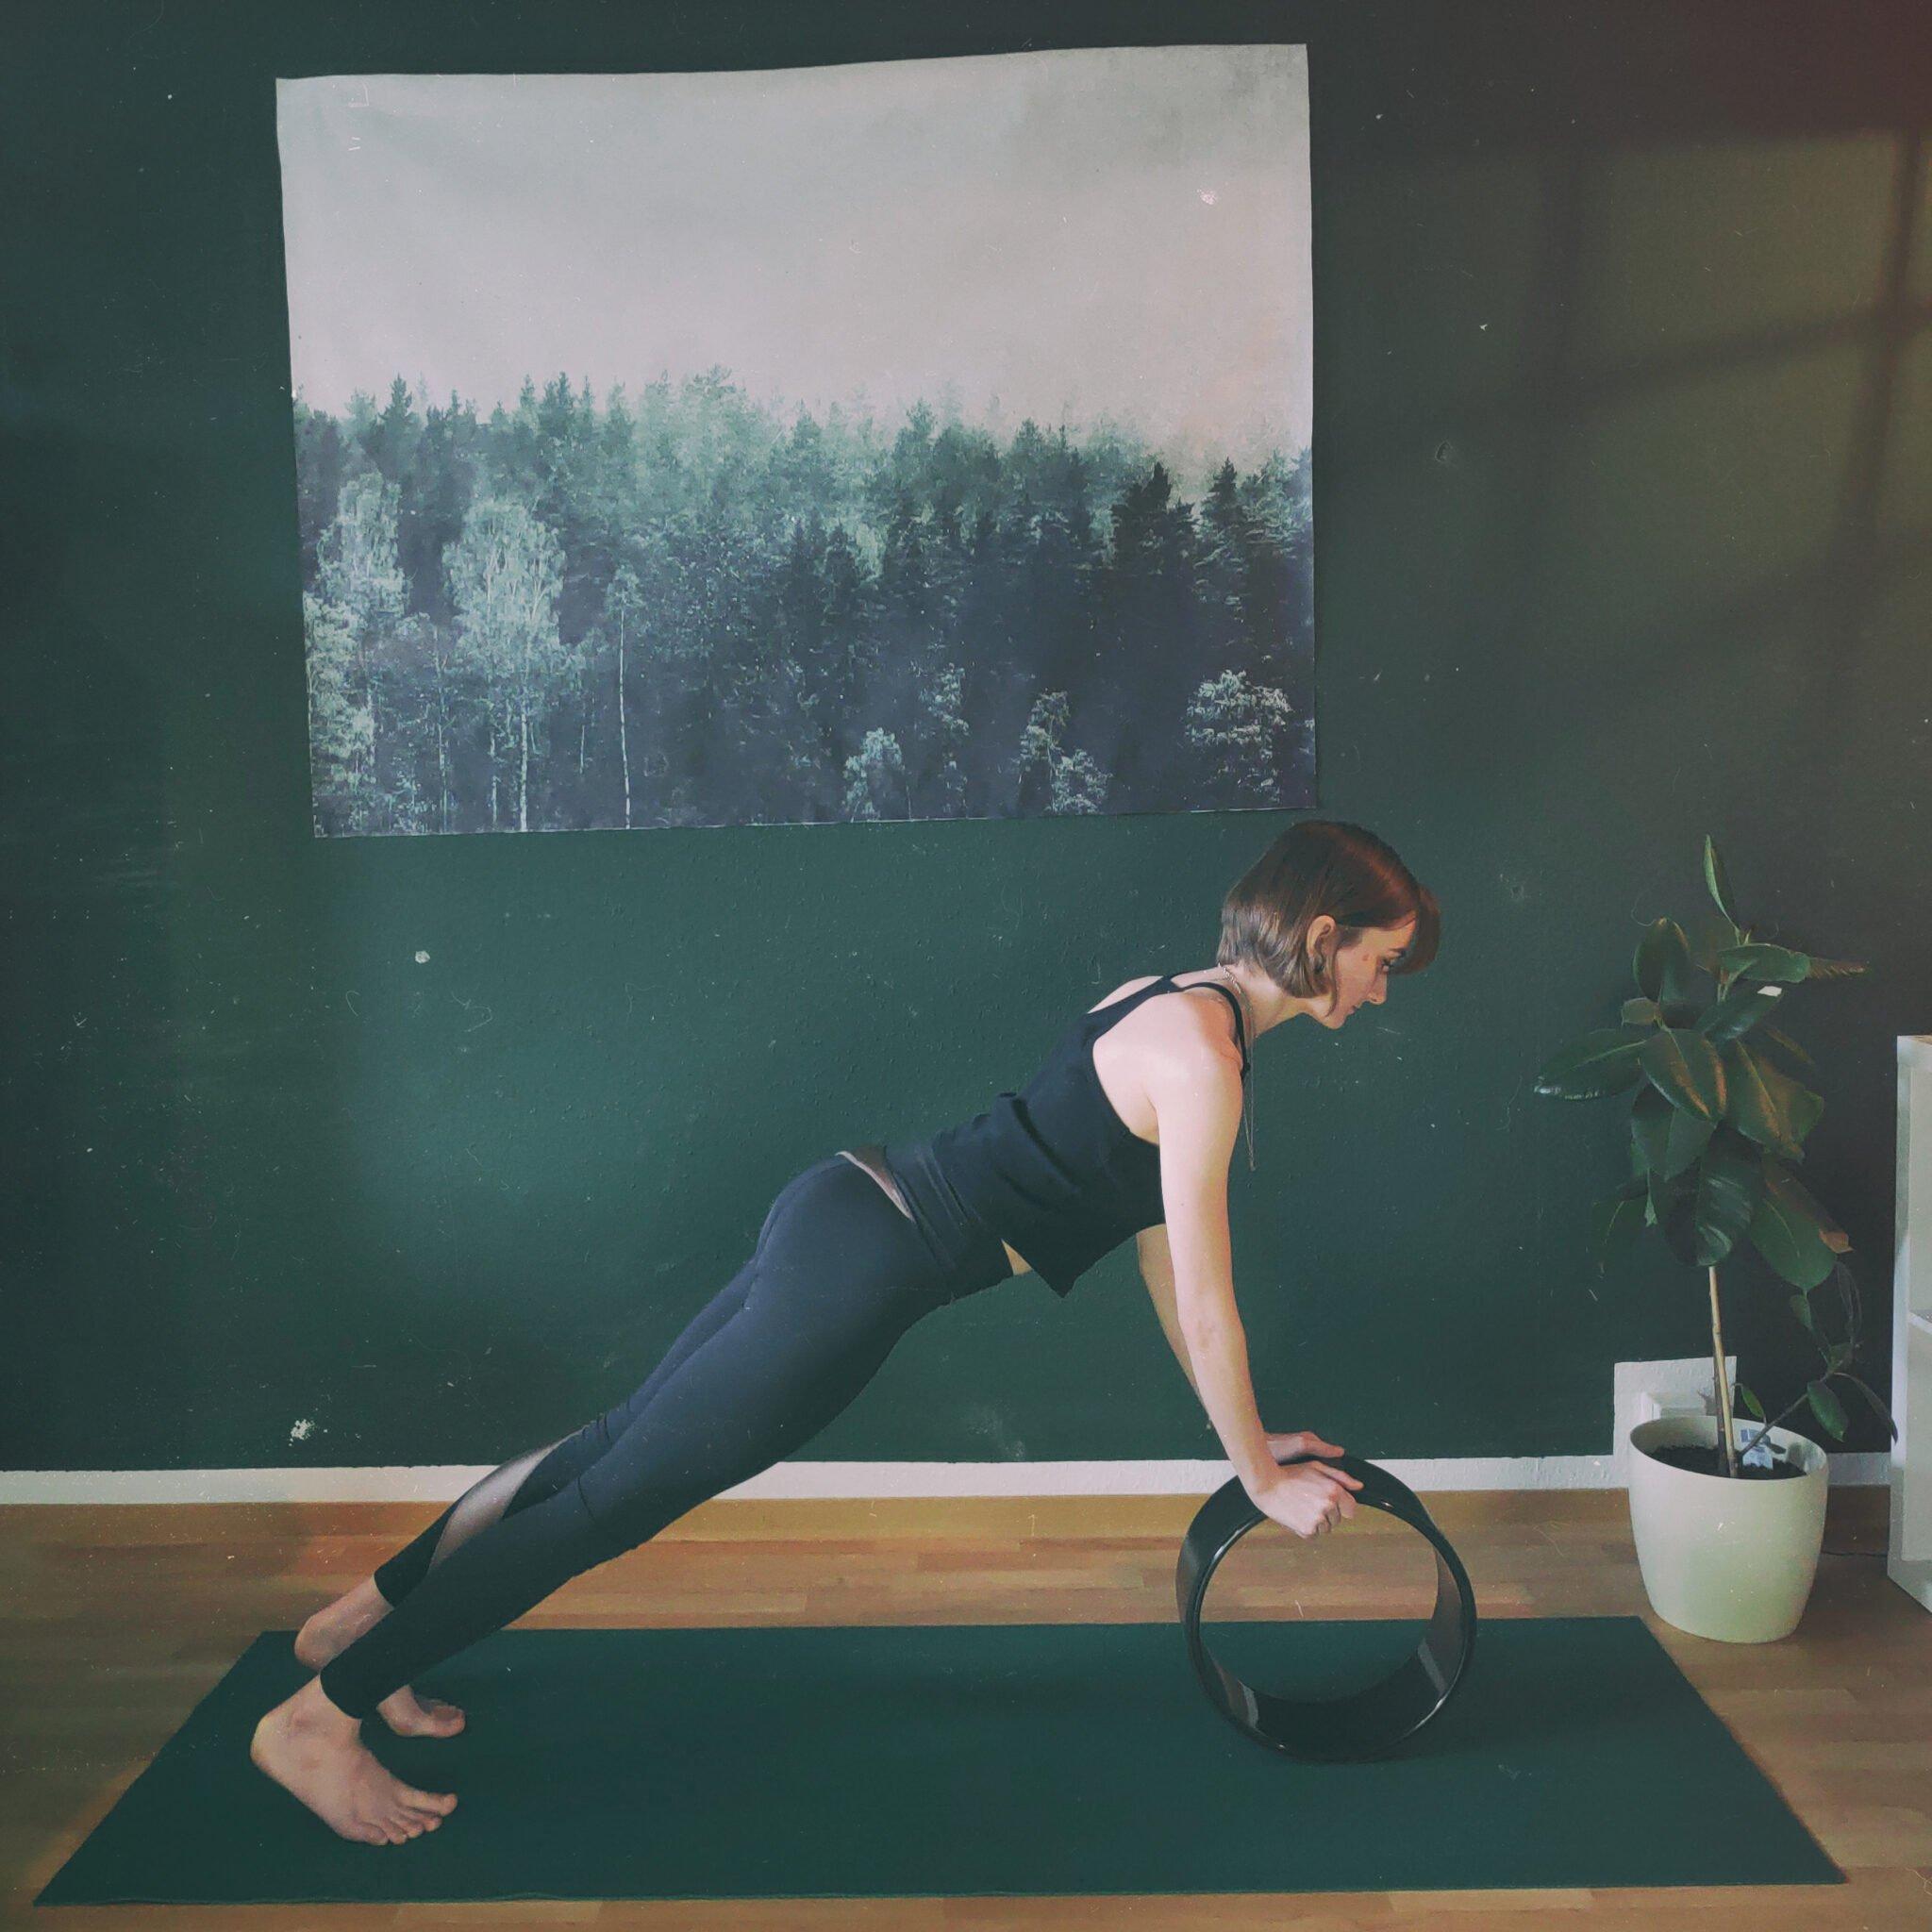 Balance Plank Photo